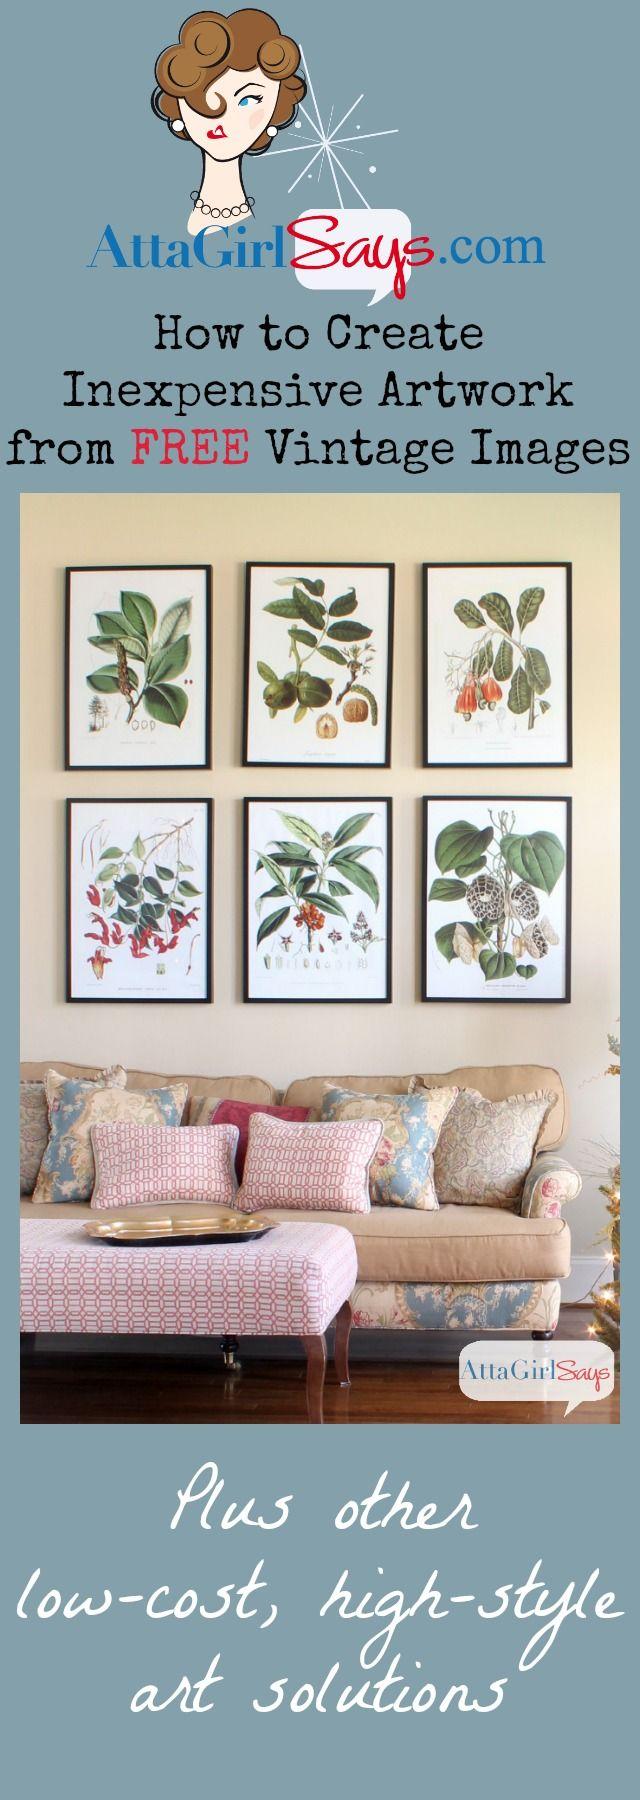 Where to find inexpensive antique botanical prints diy projects creatve inexpensive artwork with vintage botanical prints framed botanical prints botanical art cheap artwork izmirmasajfo